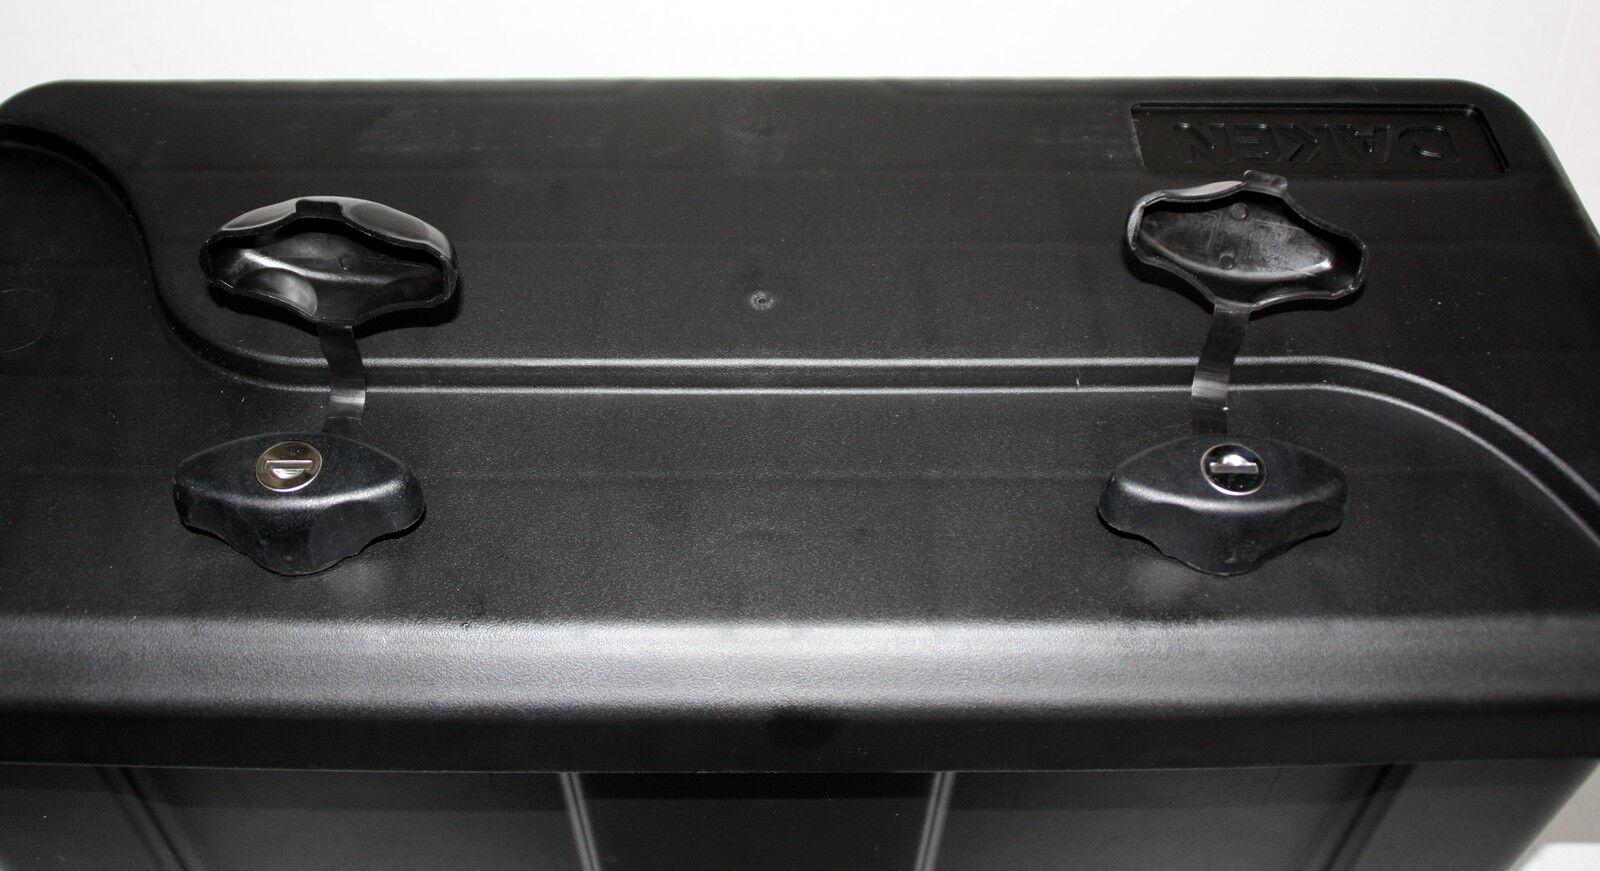 lxbxh 400x170x200 edelstahl deichselbox anh nger. Black Bedroom Furniture Sets. Home Design Ideas